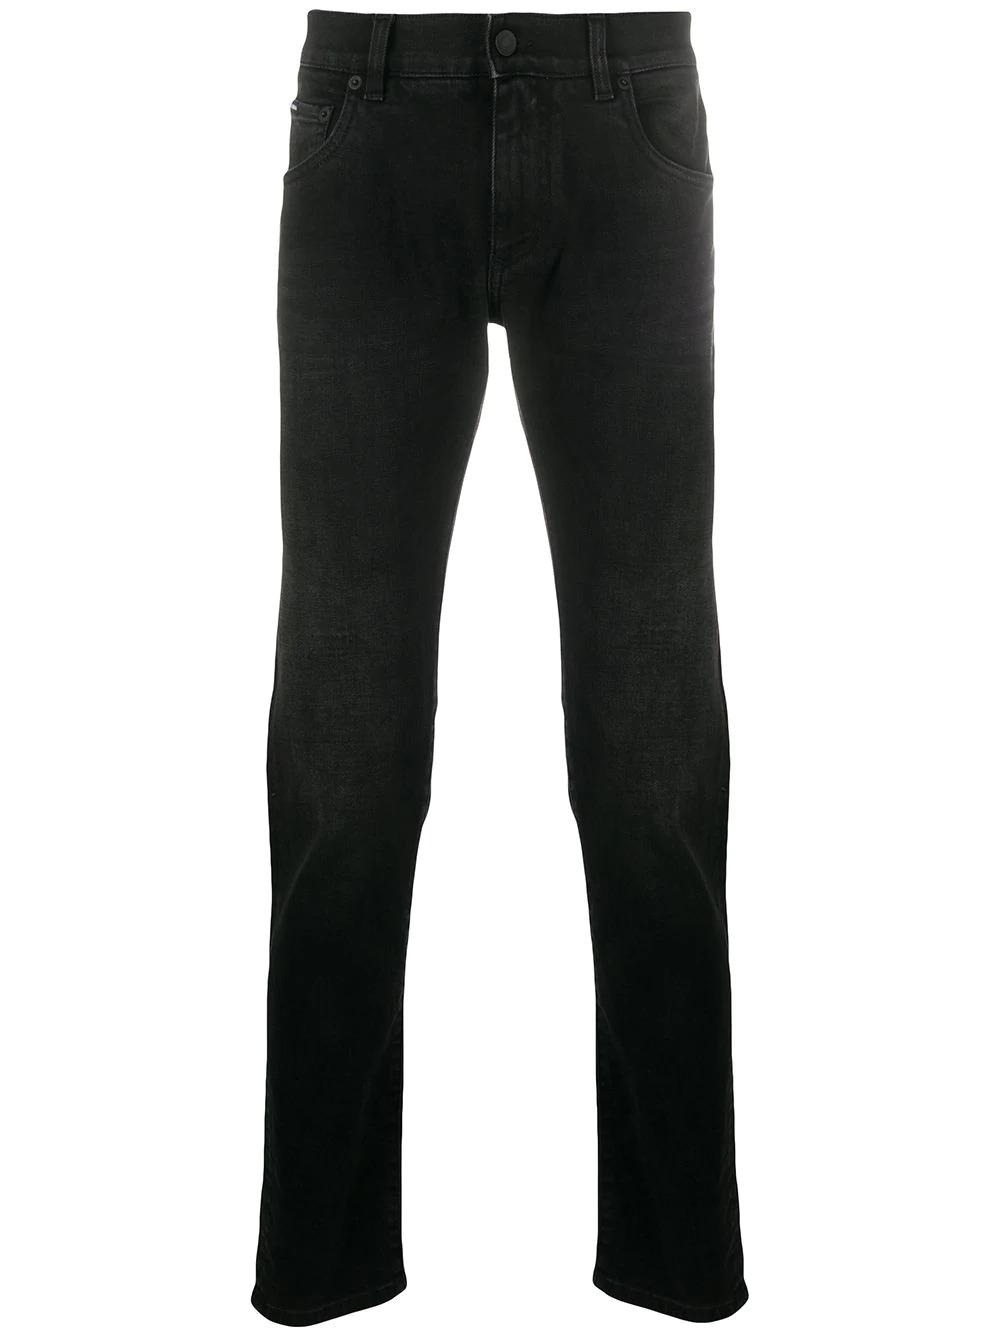 Dolce & Gabbana Slim-Fit Jeans